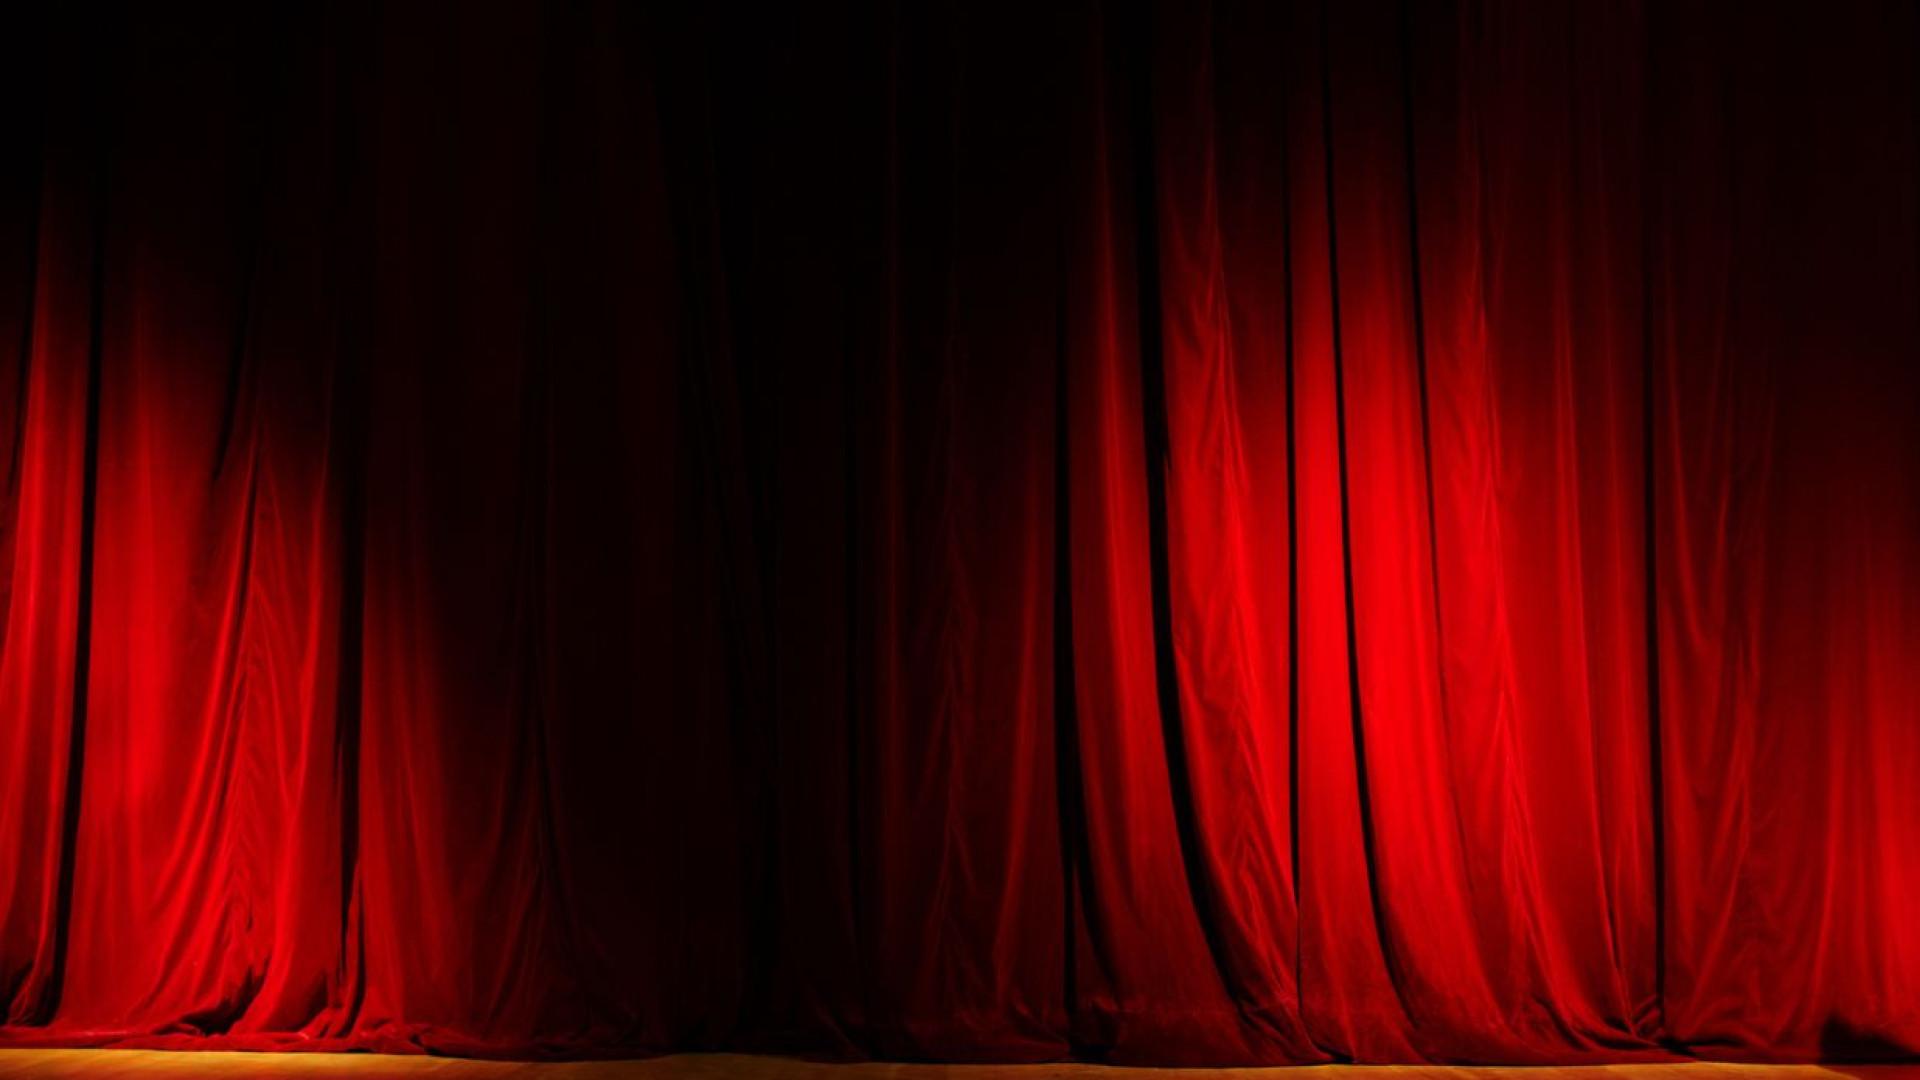 Regressa a cena ópera 'Três Mulheres com Máscara de Ferro'